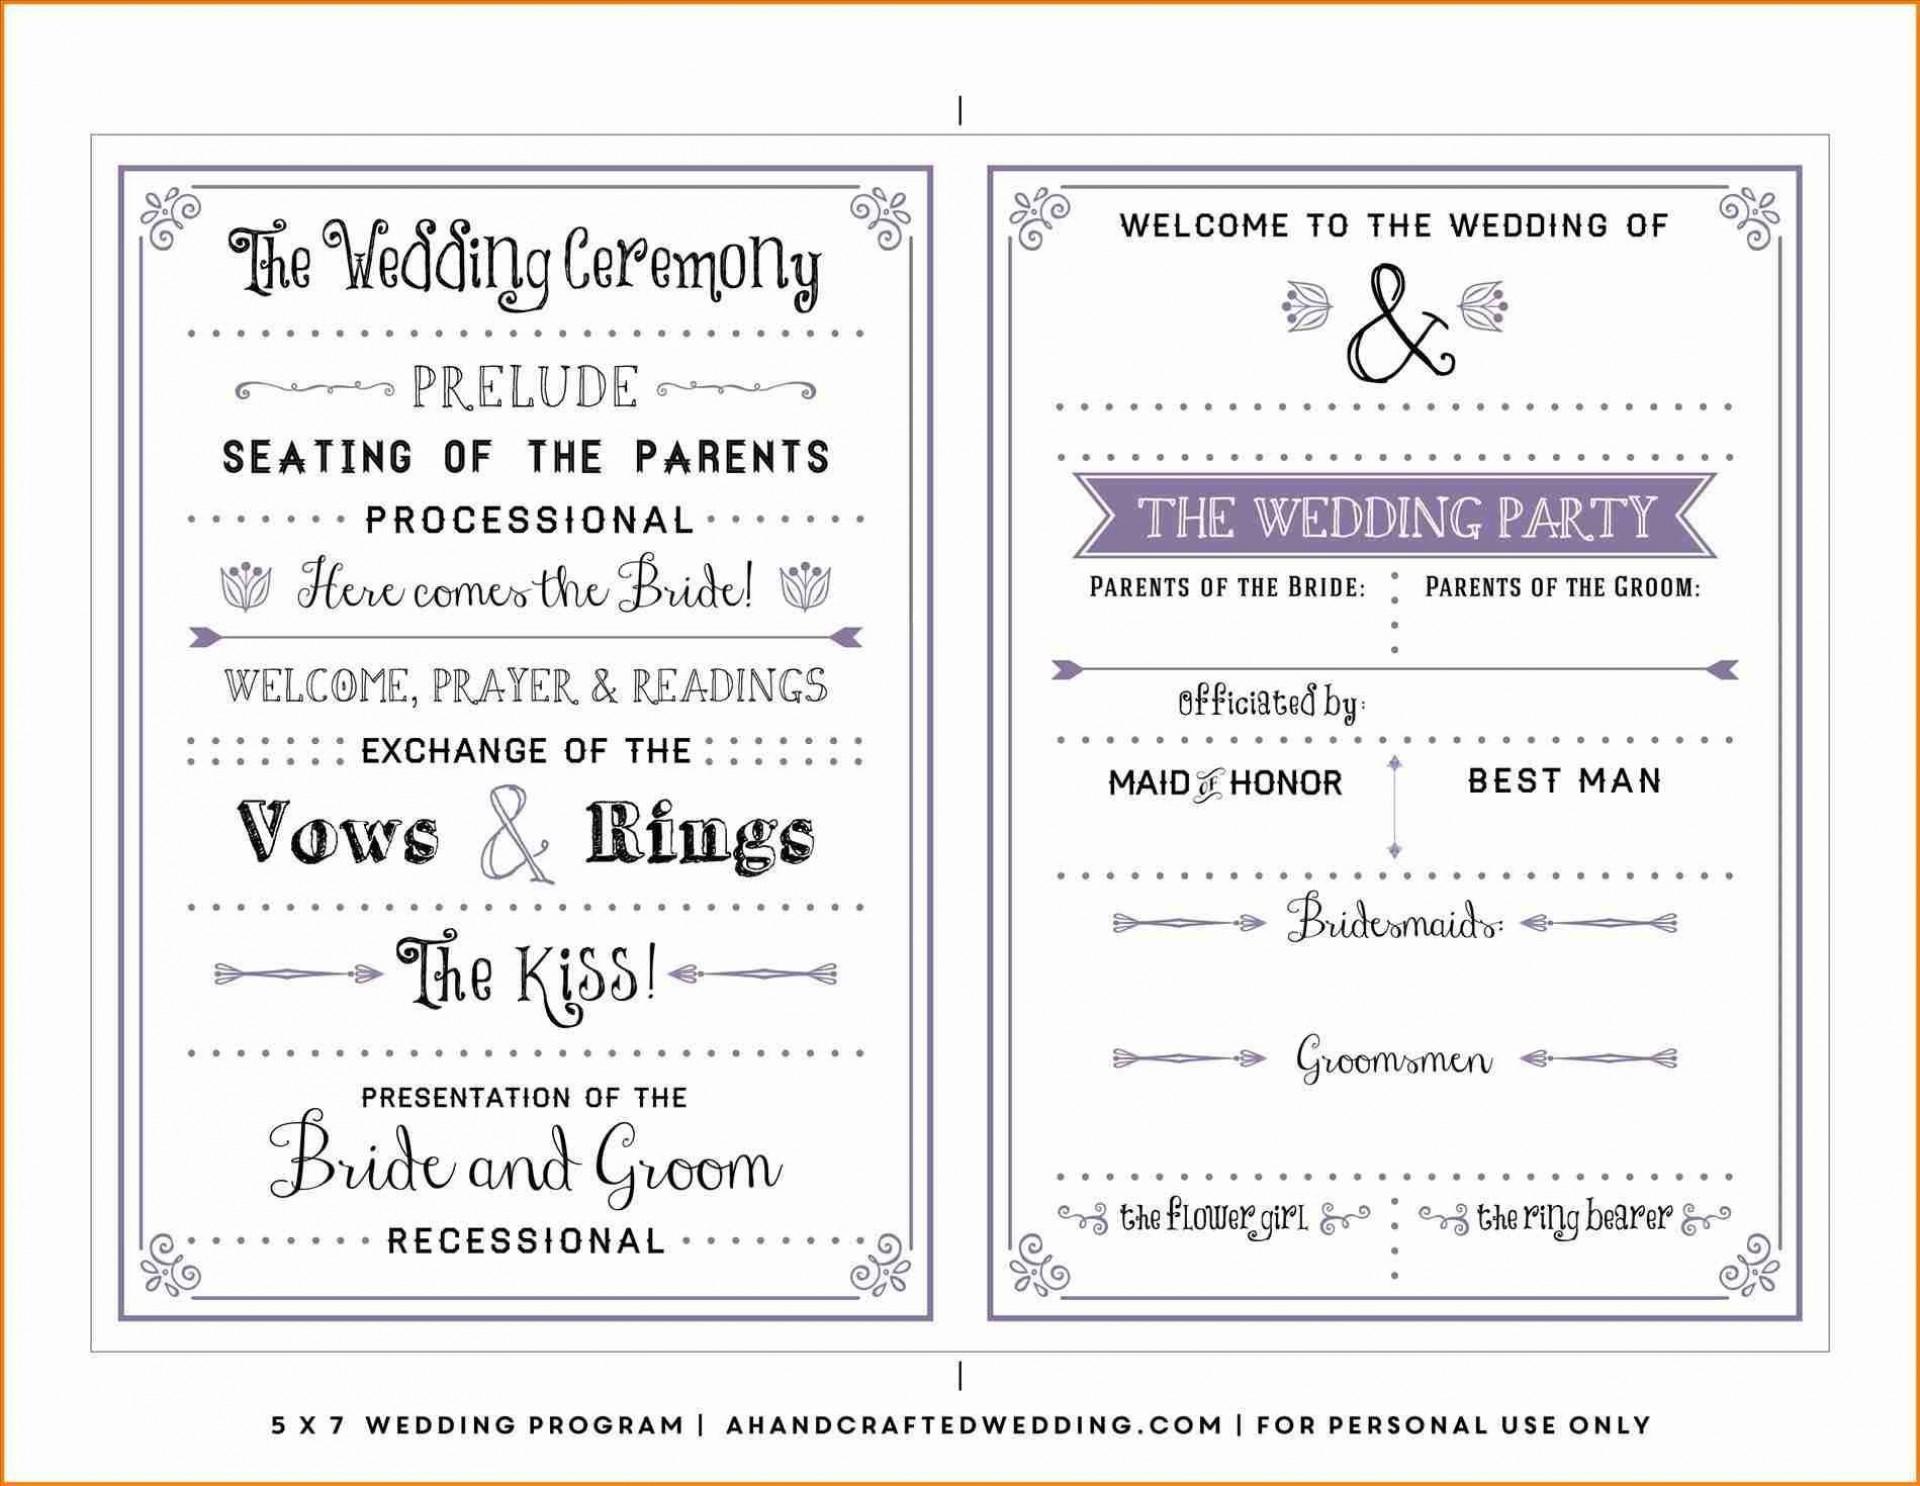 000 Unbelievable Free Wedding Program Template For Word Highest Clarity  Download Fan Microsoft Downloadable Reception1920